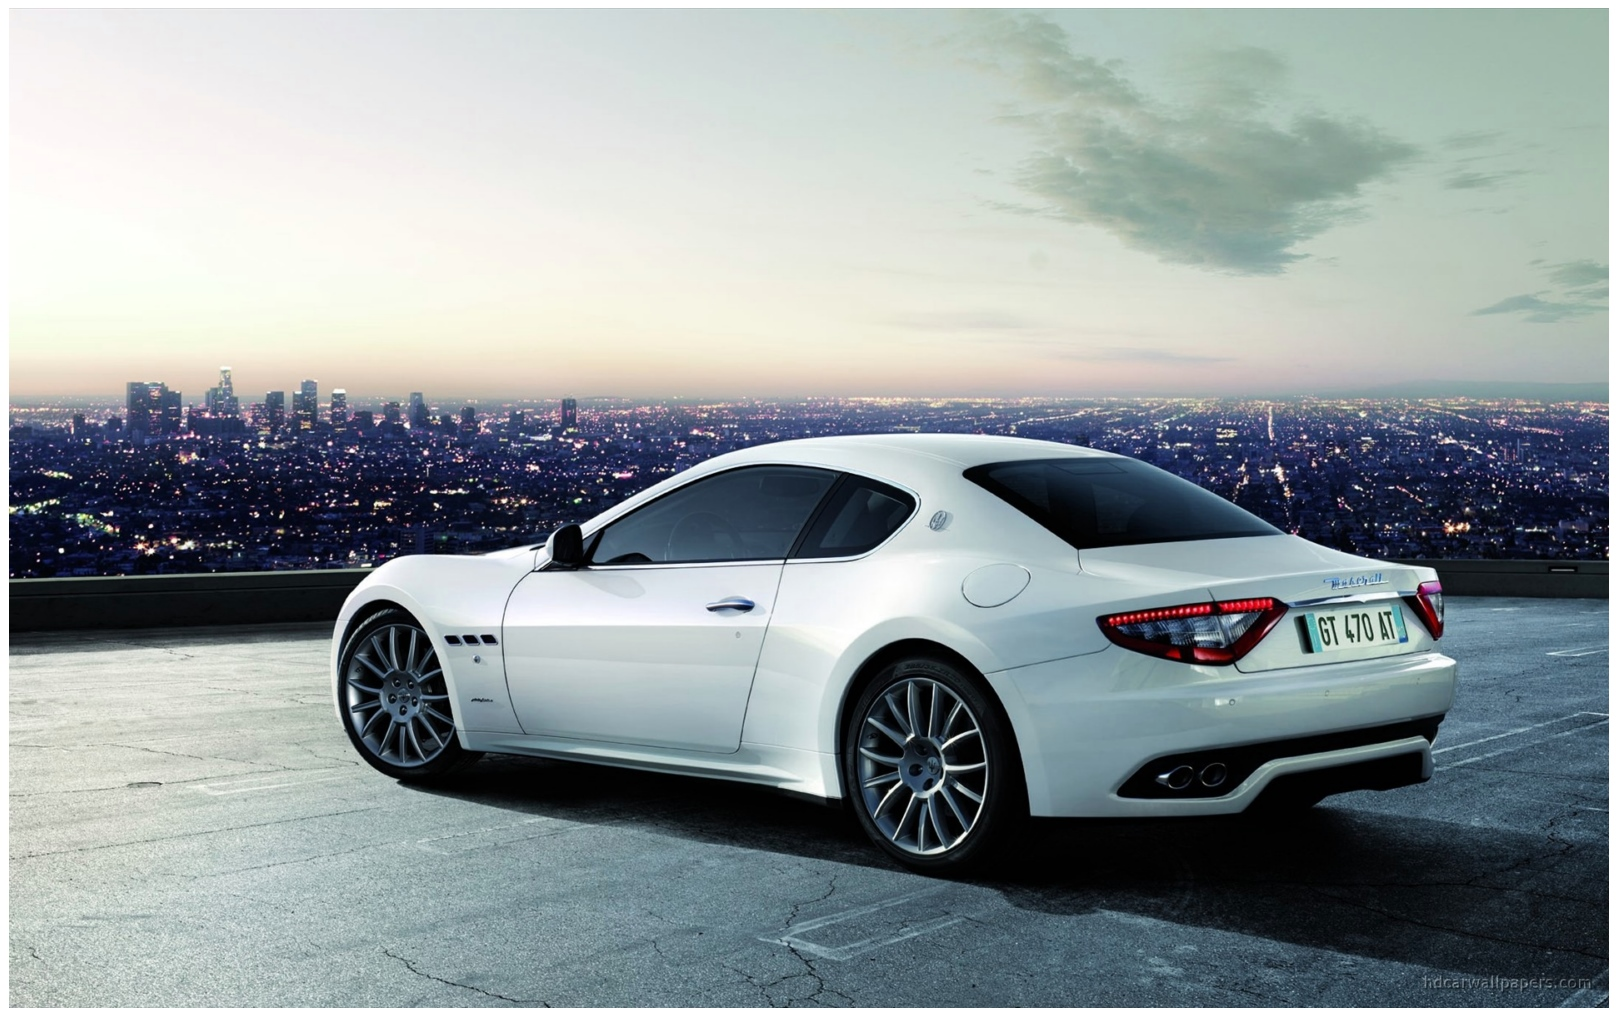 On Road Maserati Granturismo Hd Wallpapers